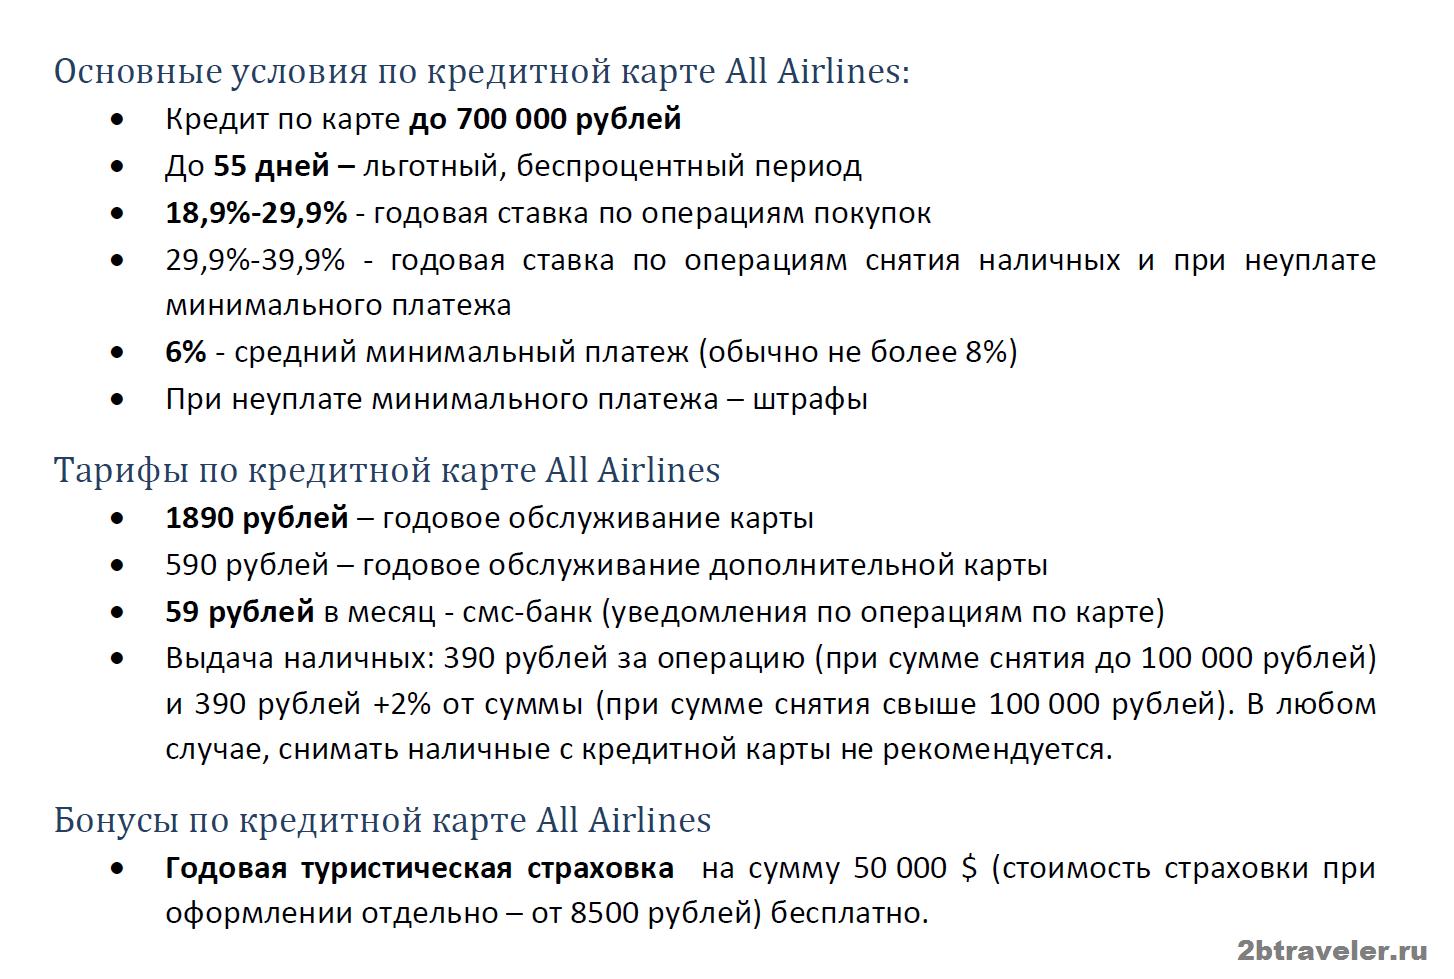 условия по кредитной карте тинькофф все авиалинии